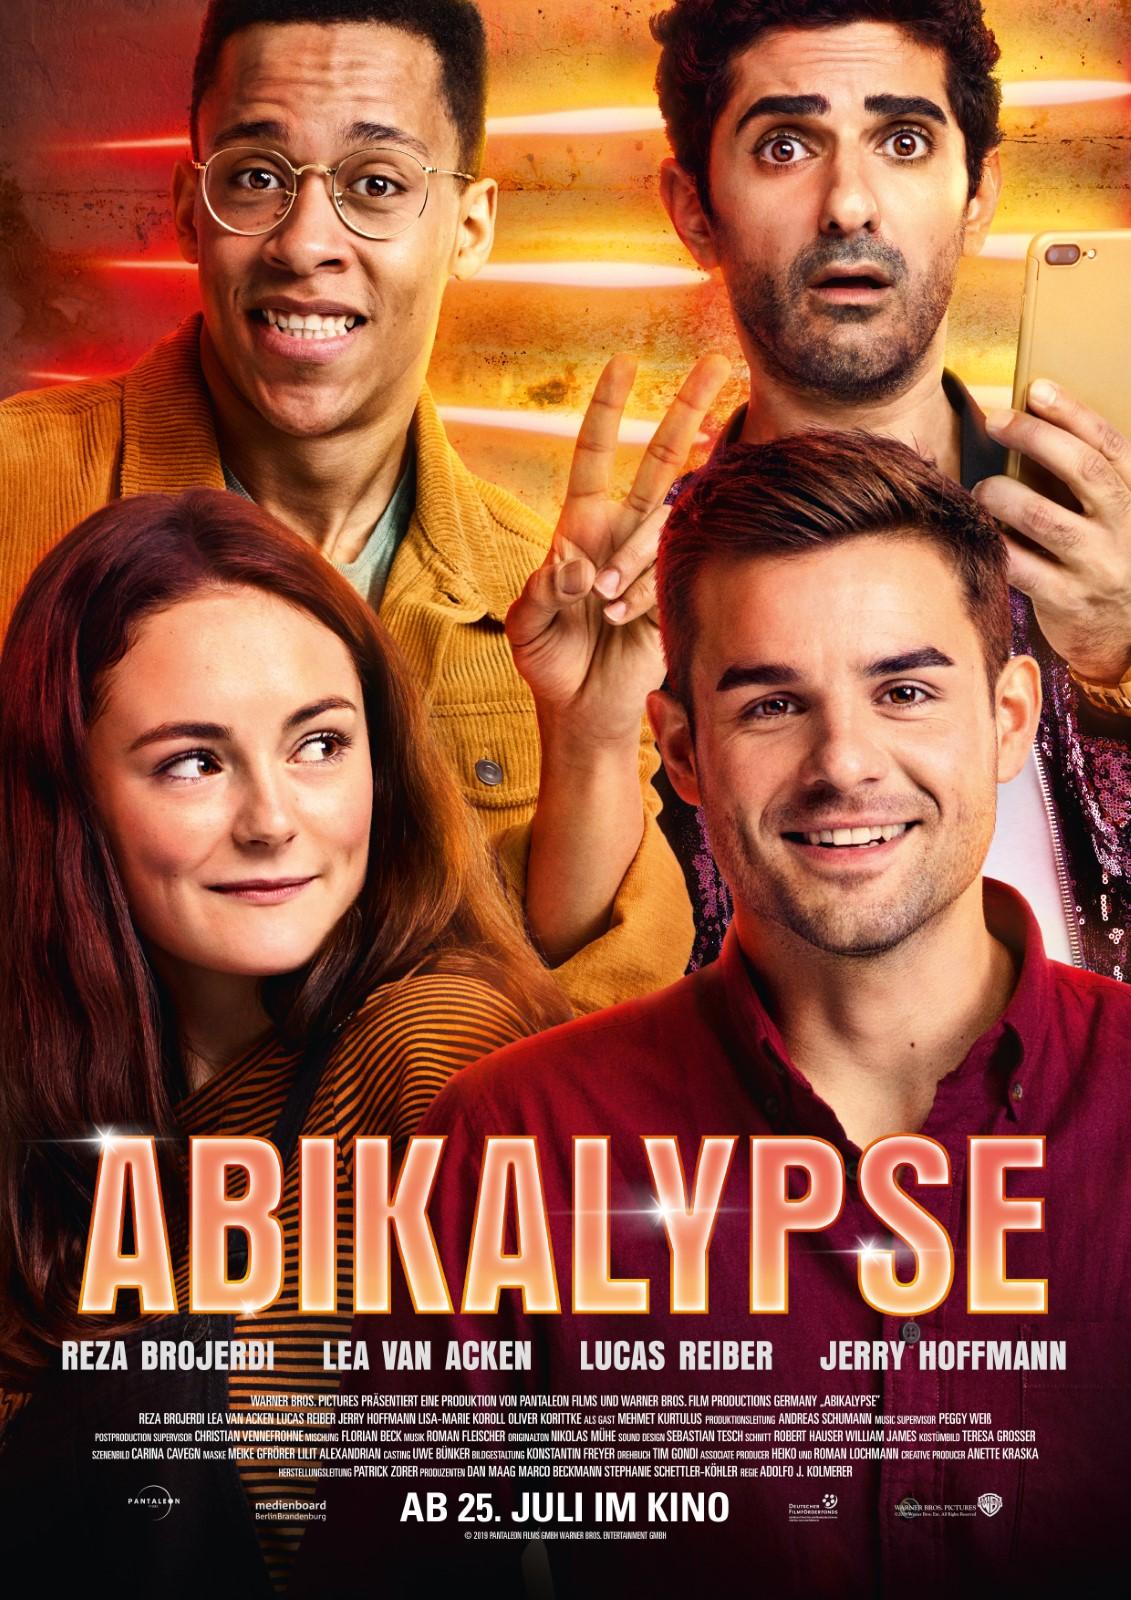 Abikalypse Film